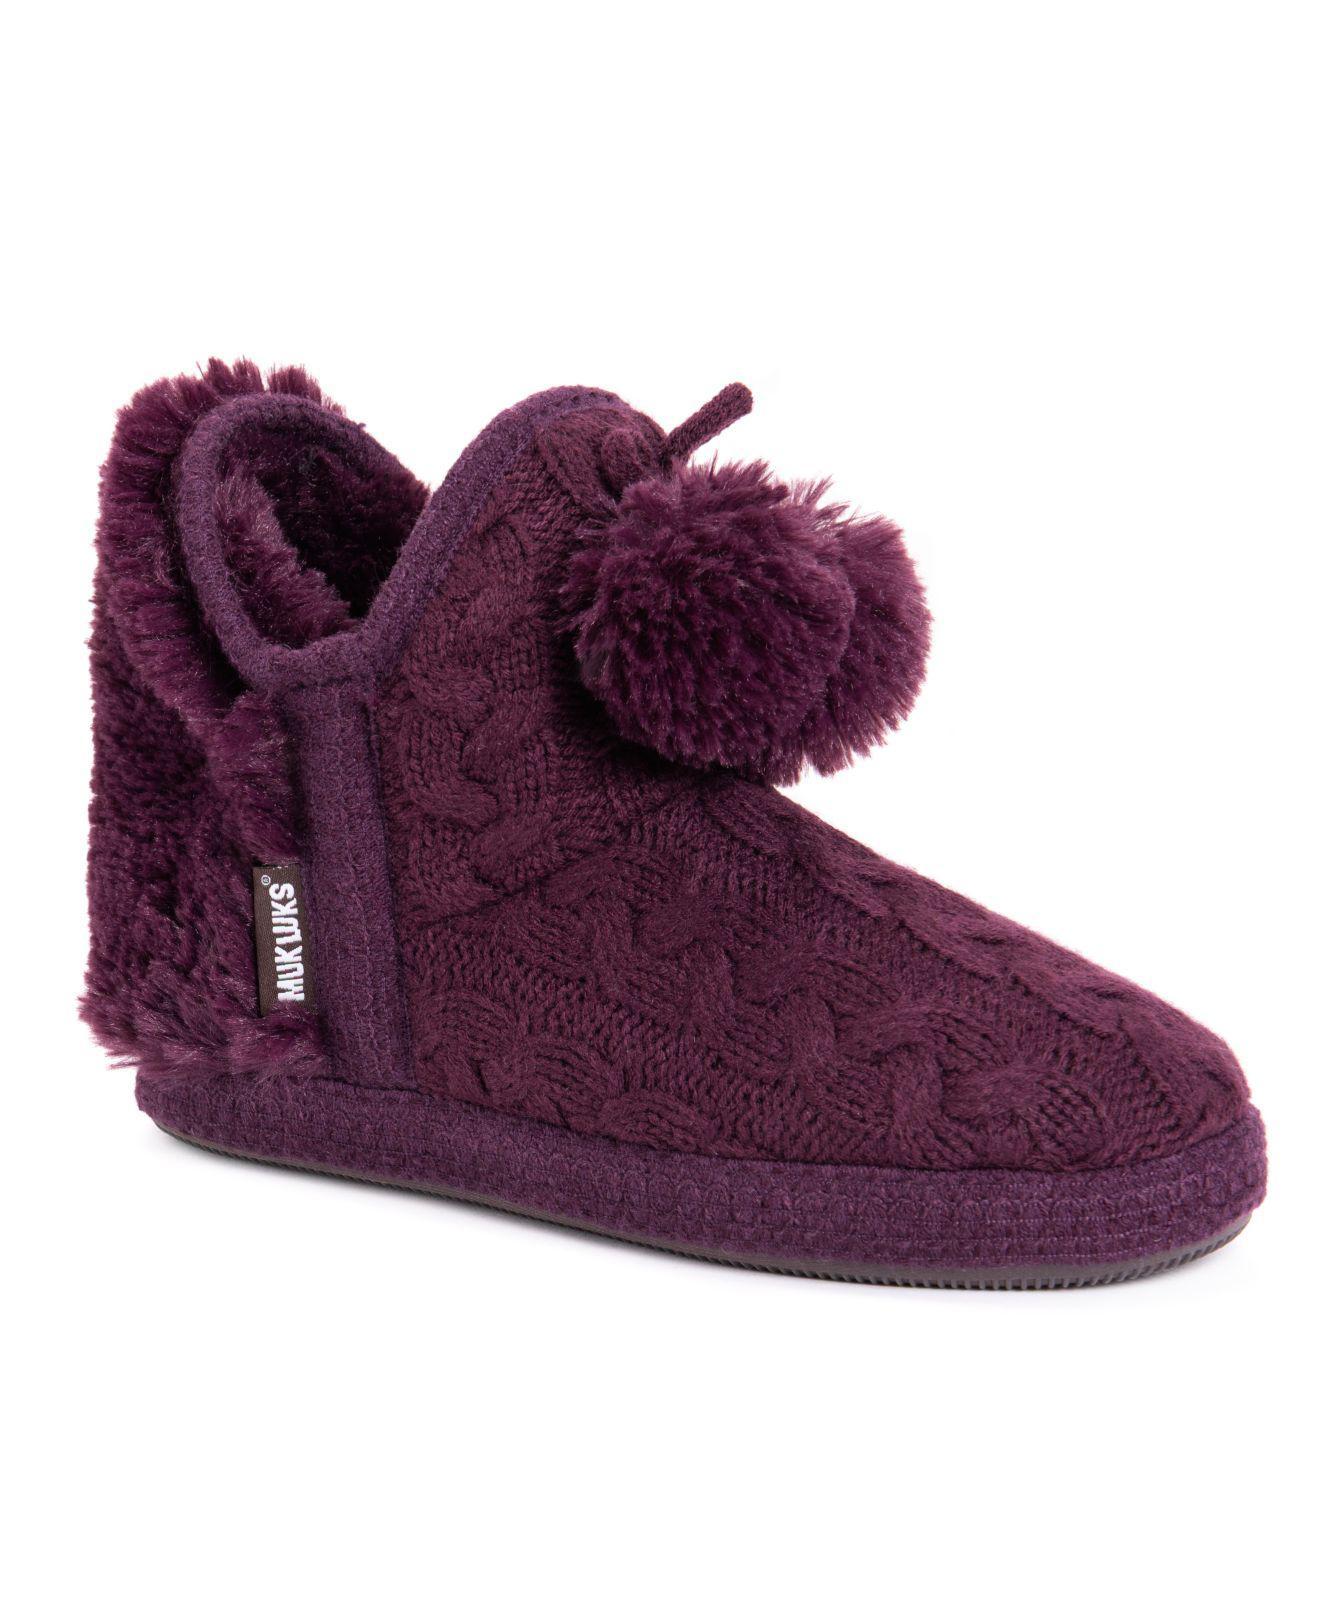 29d973ec2034 Lyst - Muk Luks Amira Boot Slippers in Purple